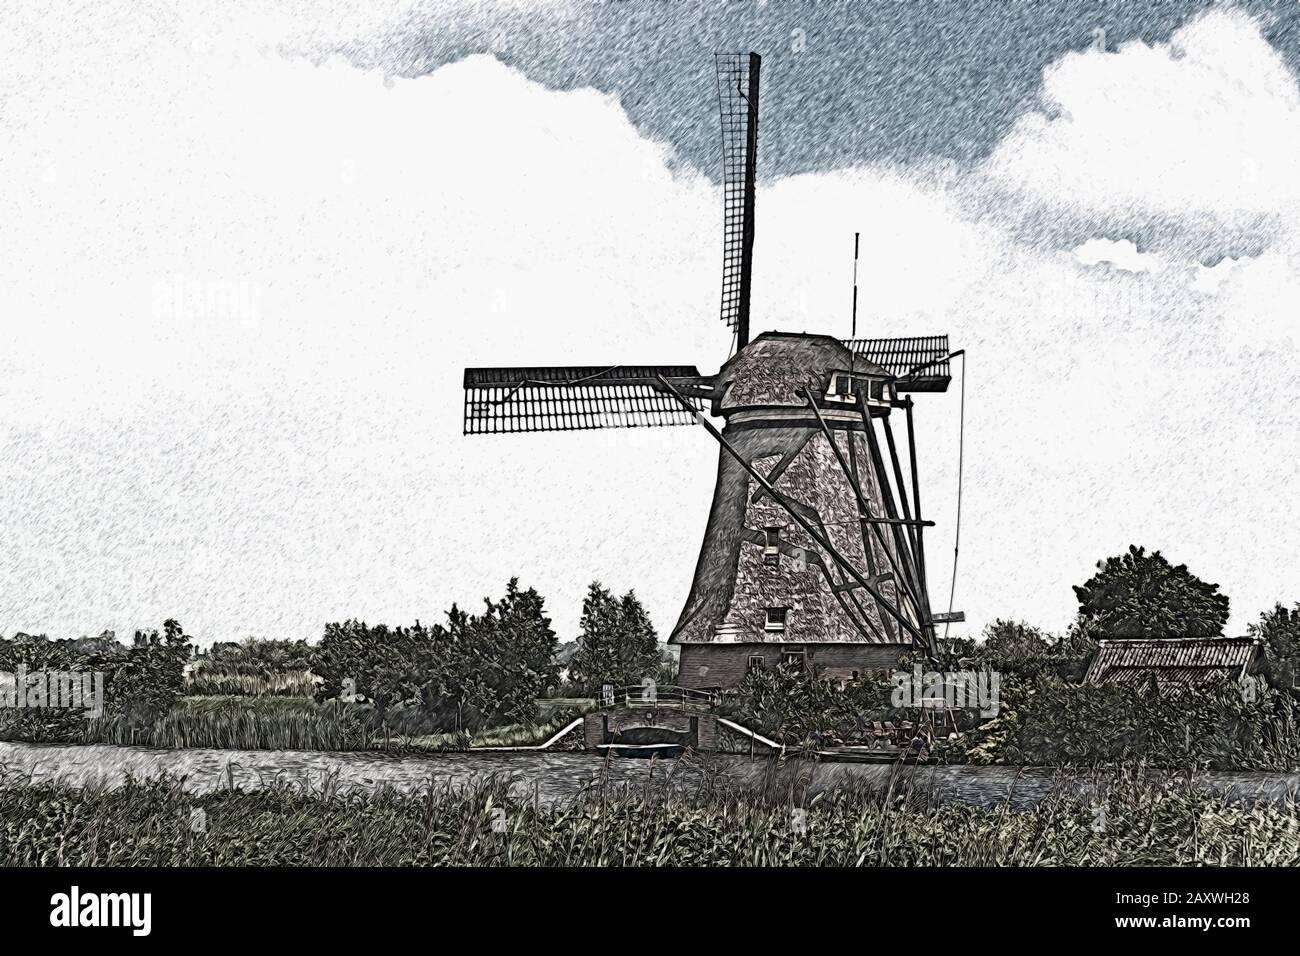 The windmills of Kinderdijk were buildt in the 18th century, Kinderdijk, South Holland, Netherlands, Europe Stock Photo